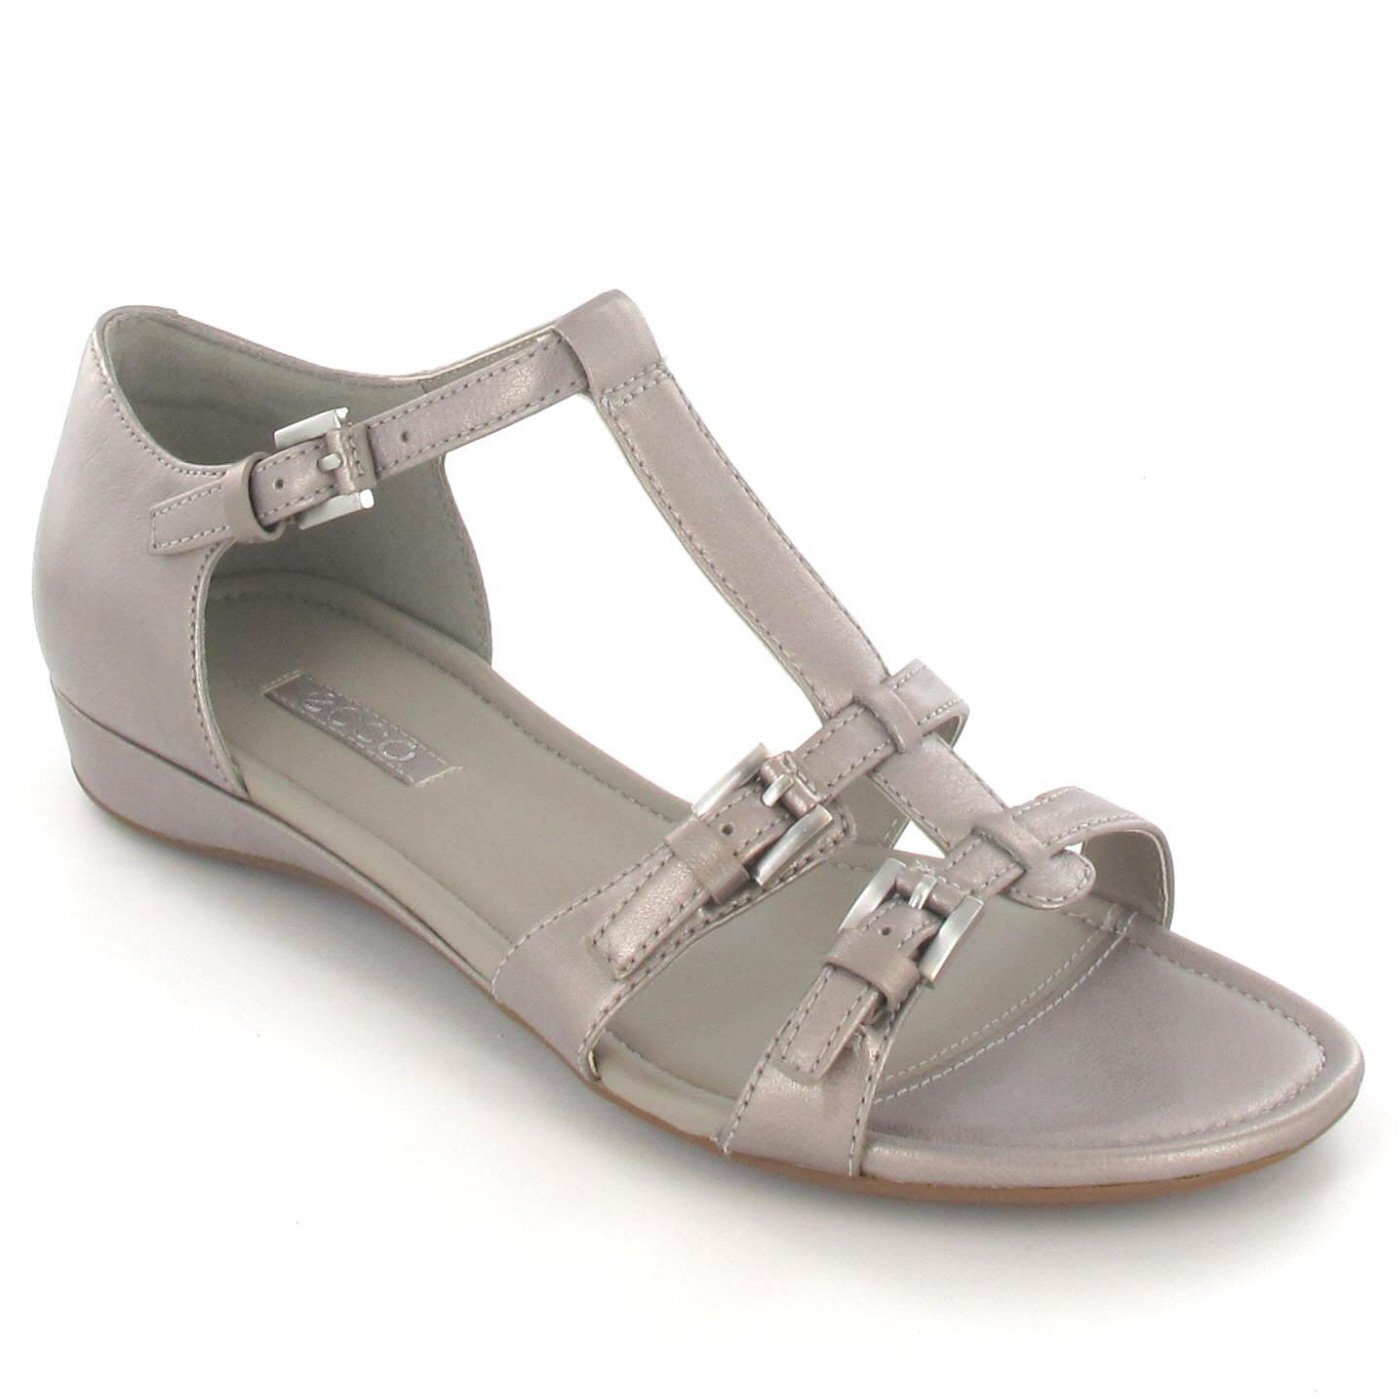 Ecco Women's Boiullon Sandal II Fashion Sandals Grey Grey